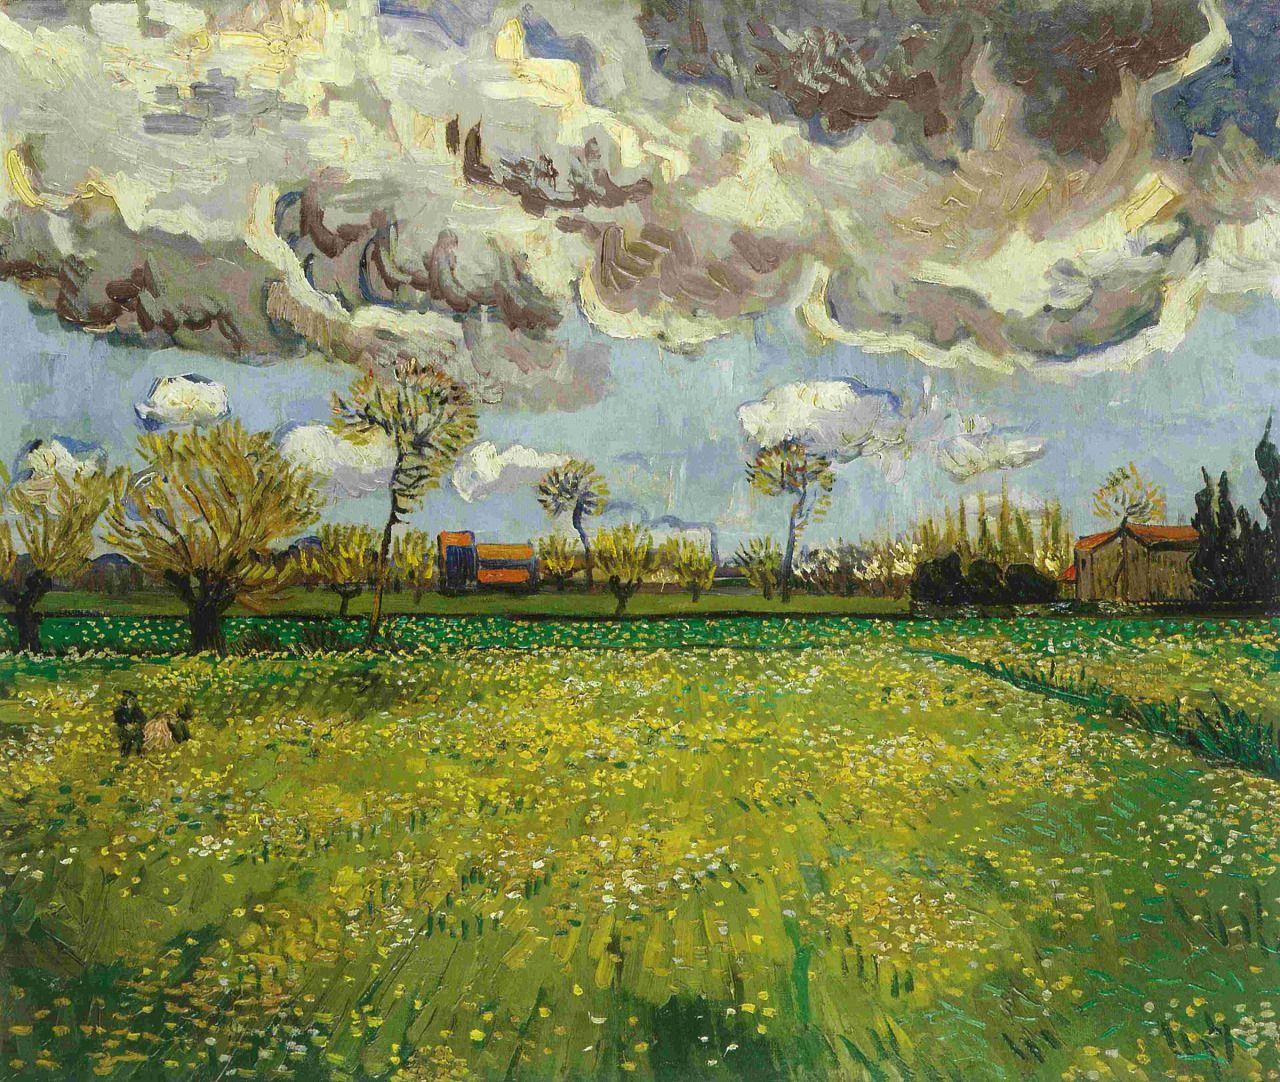 ALONGTIMEALONE: dappledwithshadow: Vincent van Gogh